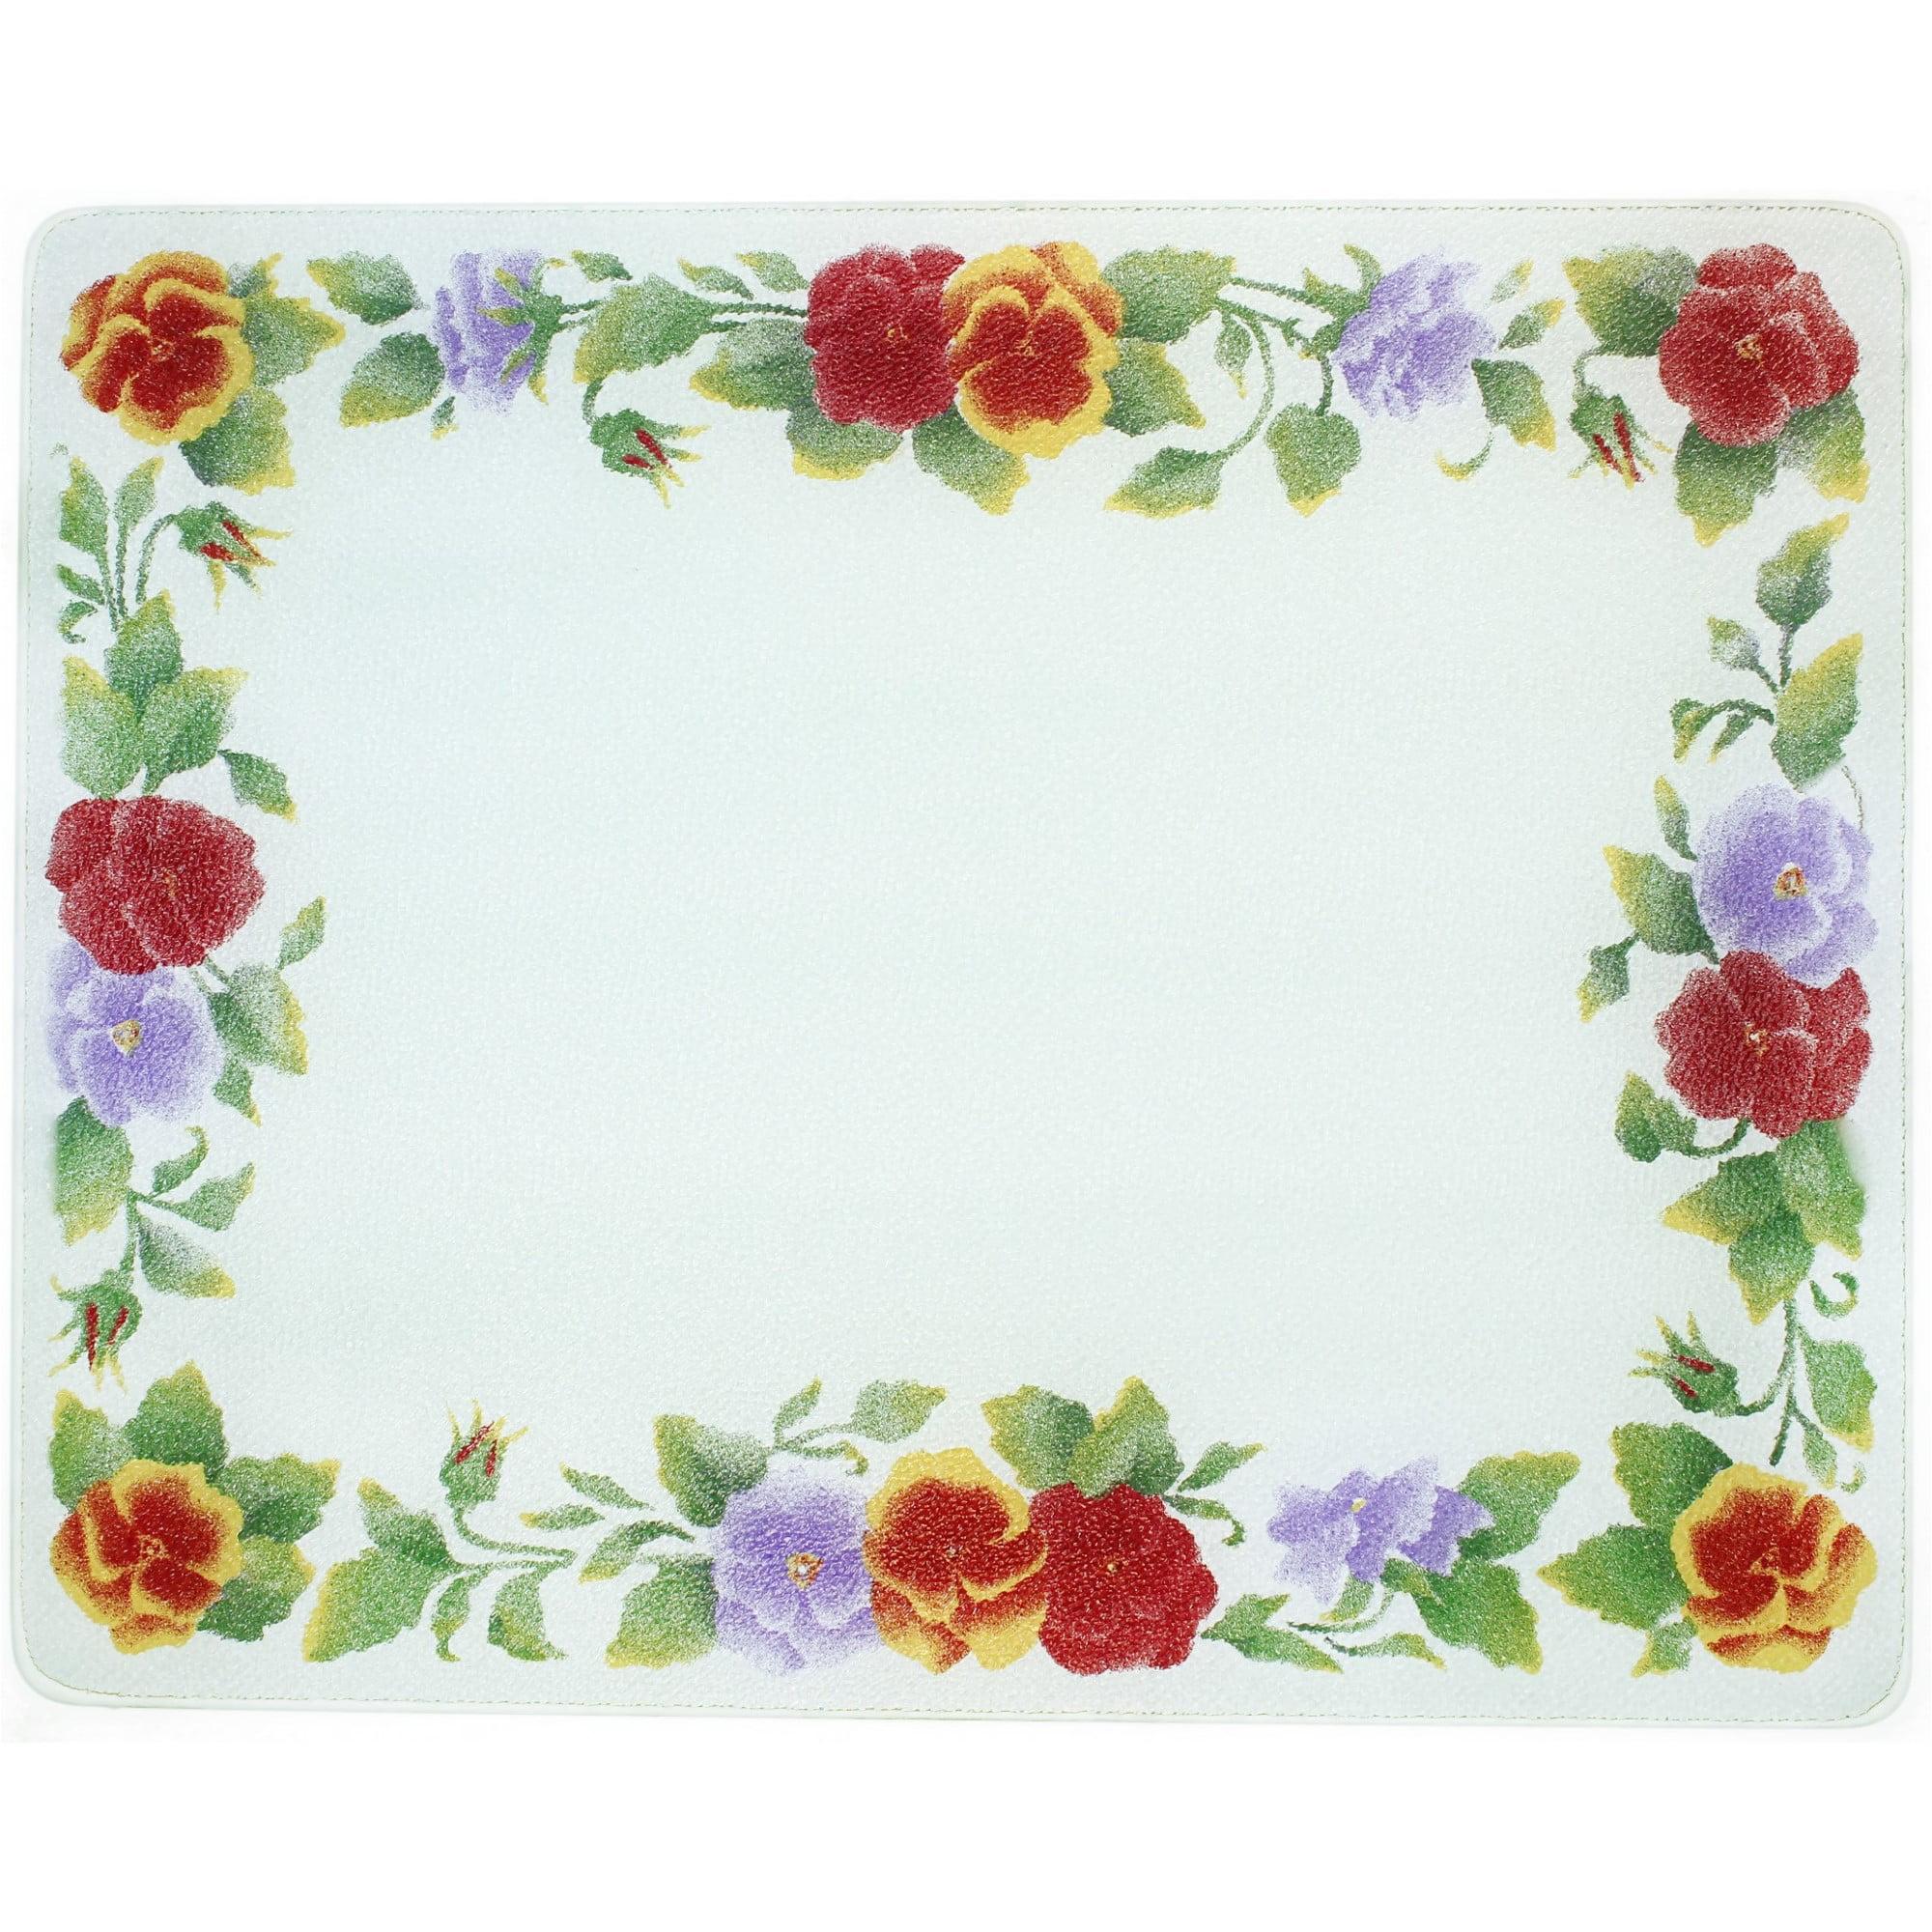 Corelle Summer Blush 15 X 12 inch Counter Saver Tempered Glass Cutting Board, 91512SMBH